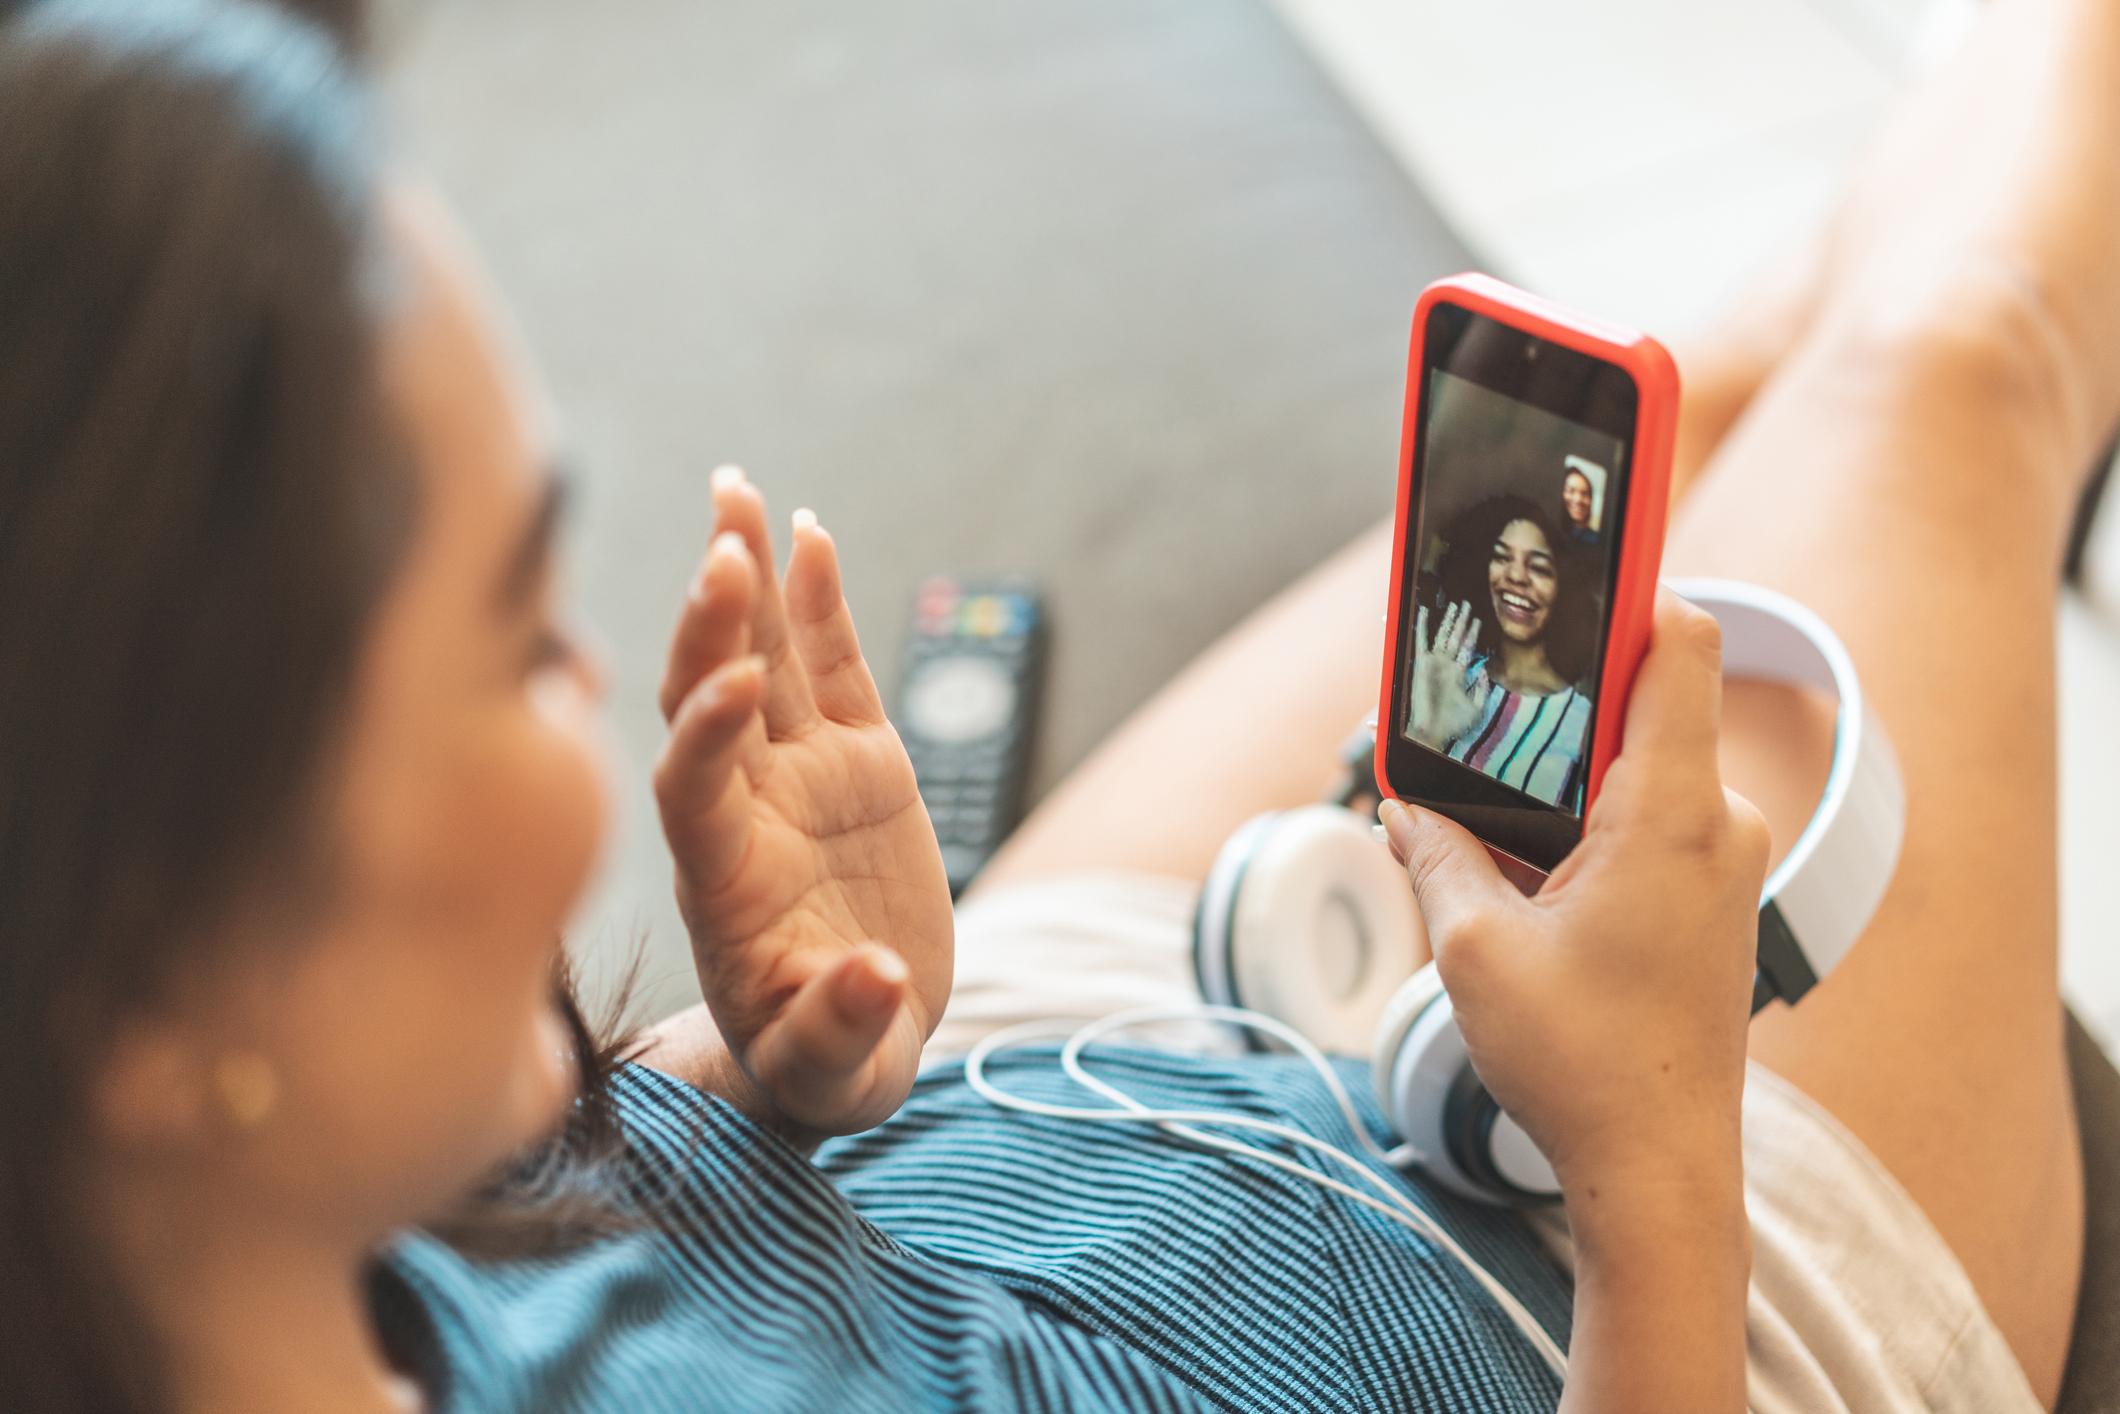 Social Media Brings Everyone Together During Social Distancing